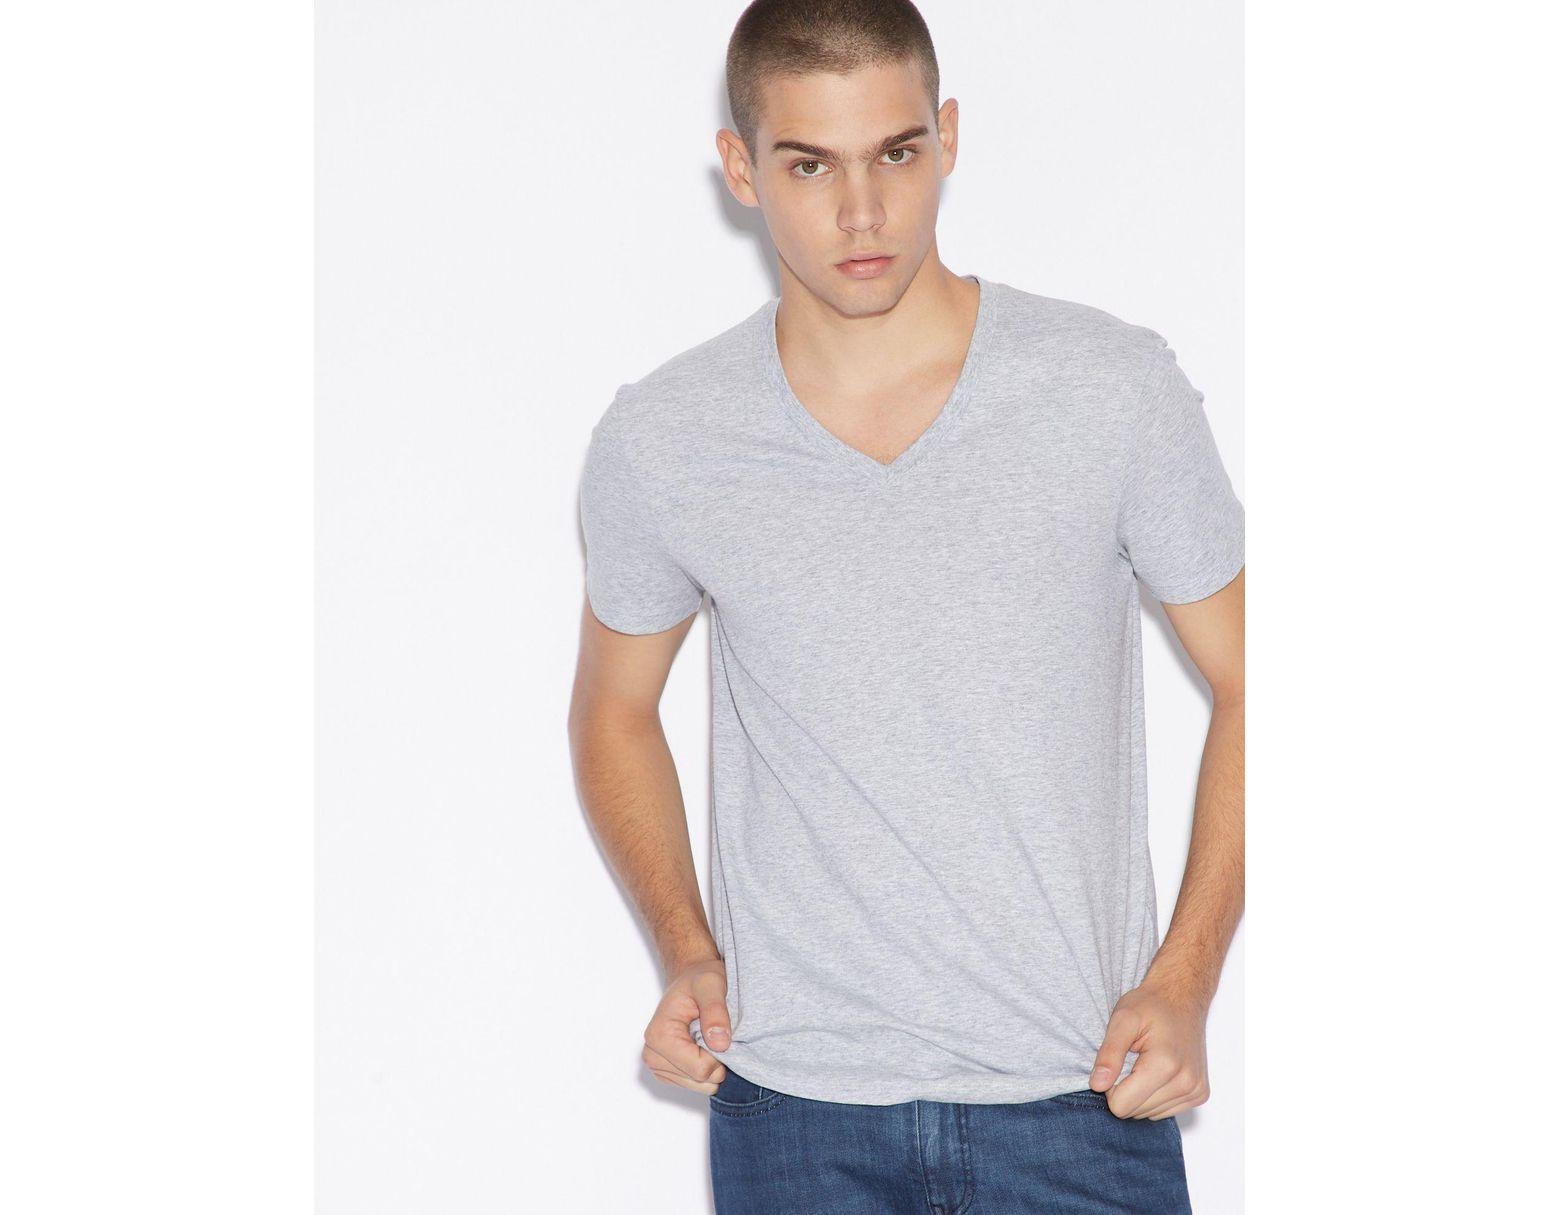 a93cd2cae3 Men's Gray Slim-fit V-neck Pima Cotton T-shirt